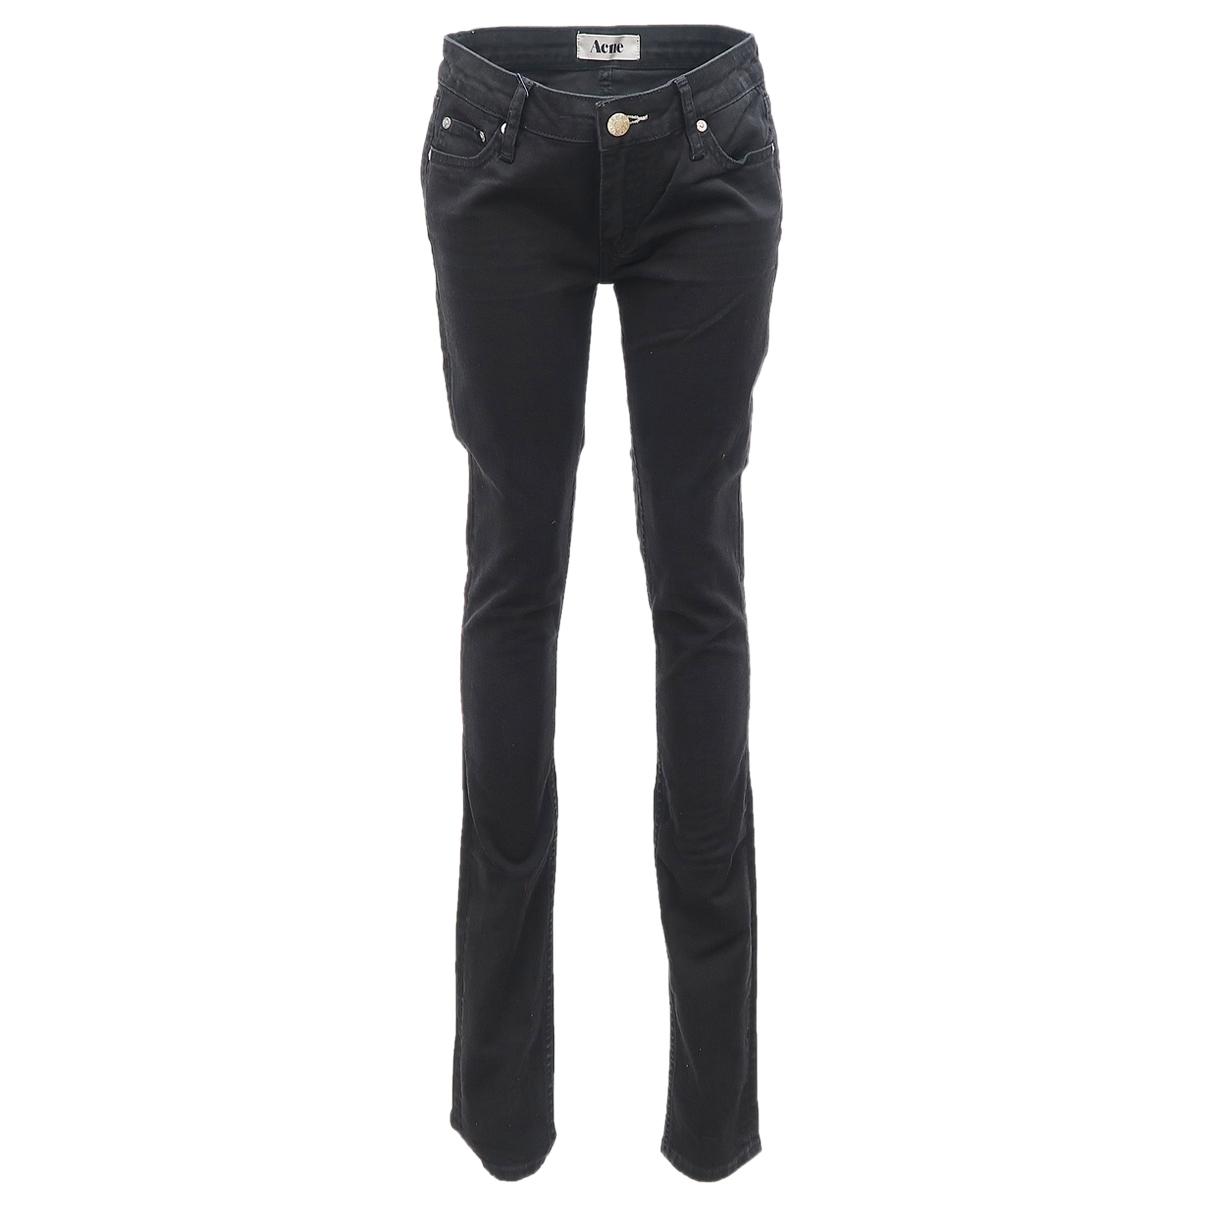 Acne Studios \N Black Cotton - elasthane Jeans for Women 27 US